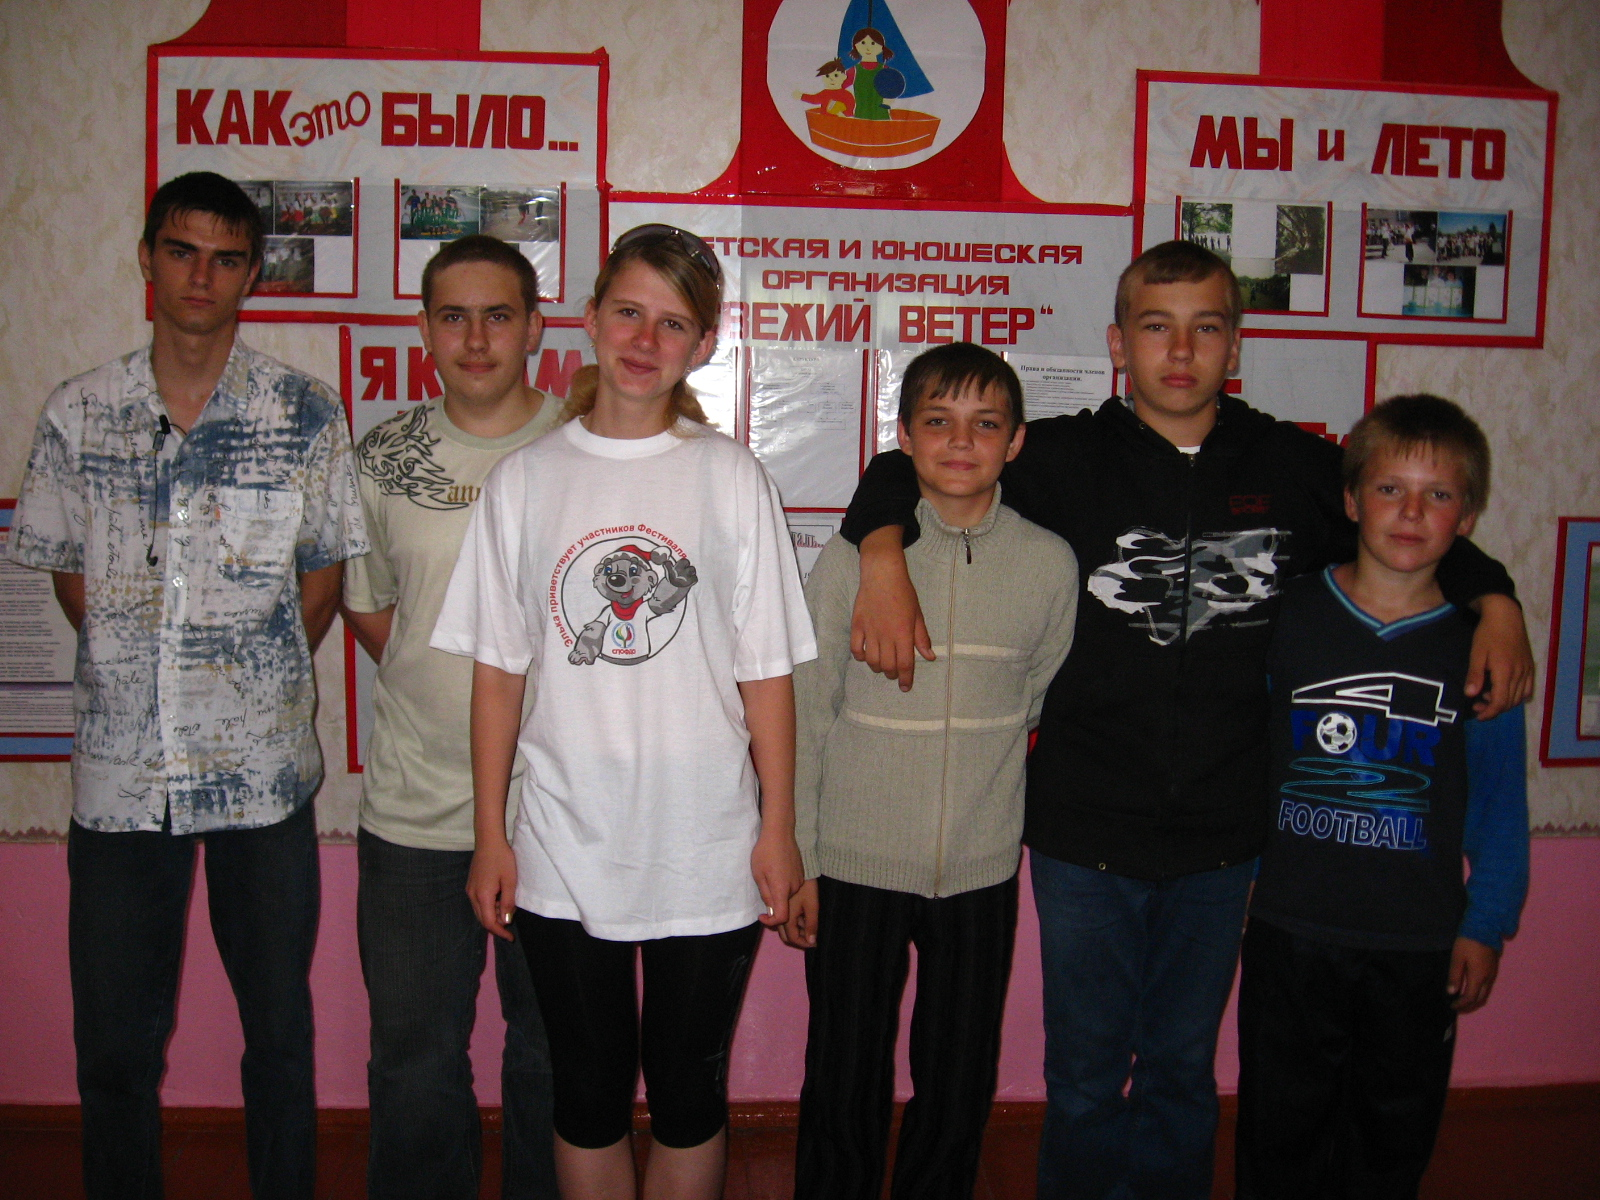 http://urivskscool.narod.ru/img_4344.jpg